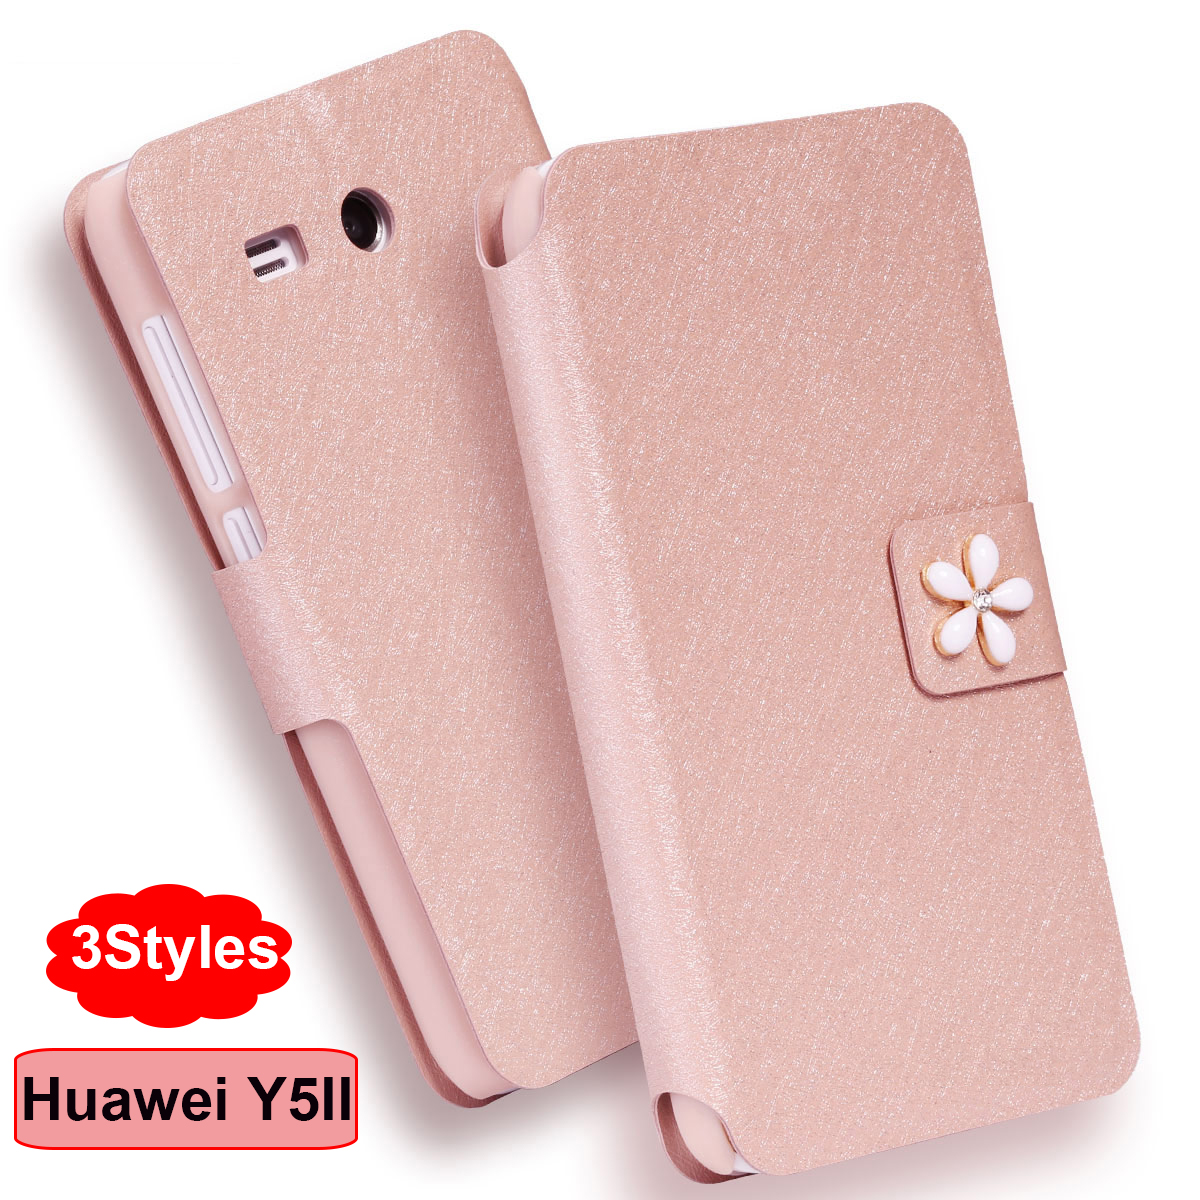 (3 sloge) Huawei Y5 II etui luksuzna PU usnjena torbica za Huawei Y5 - Dodatki in nadomestni deli za mobilne telefone